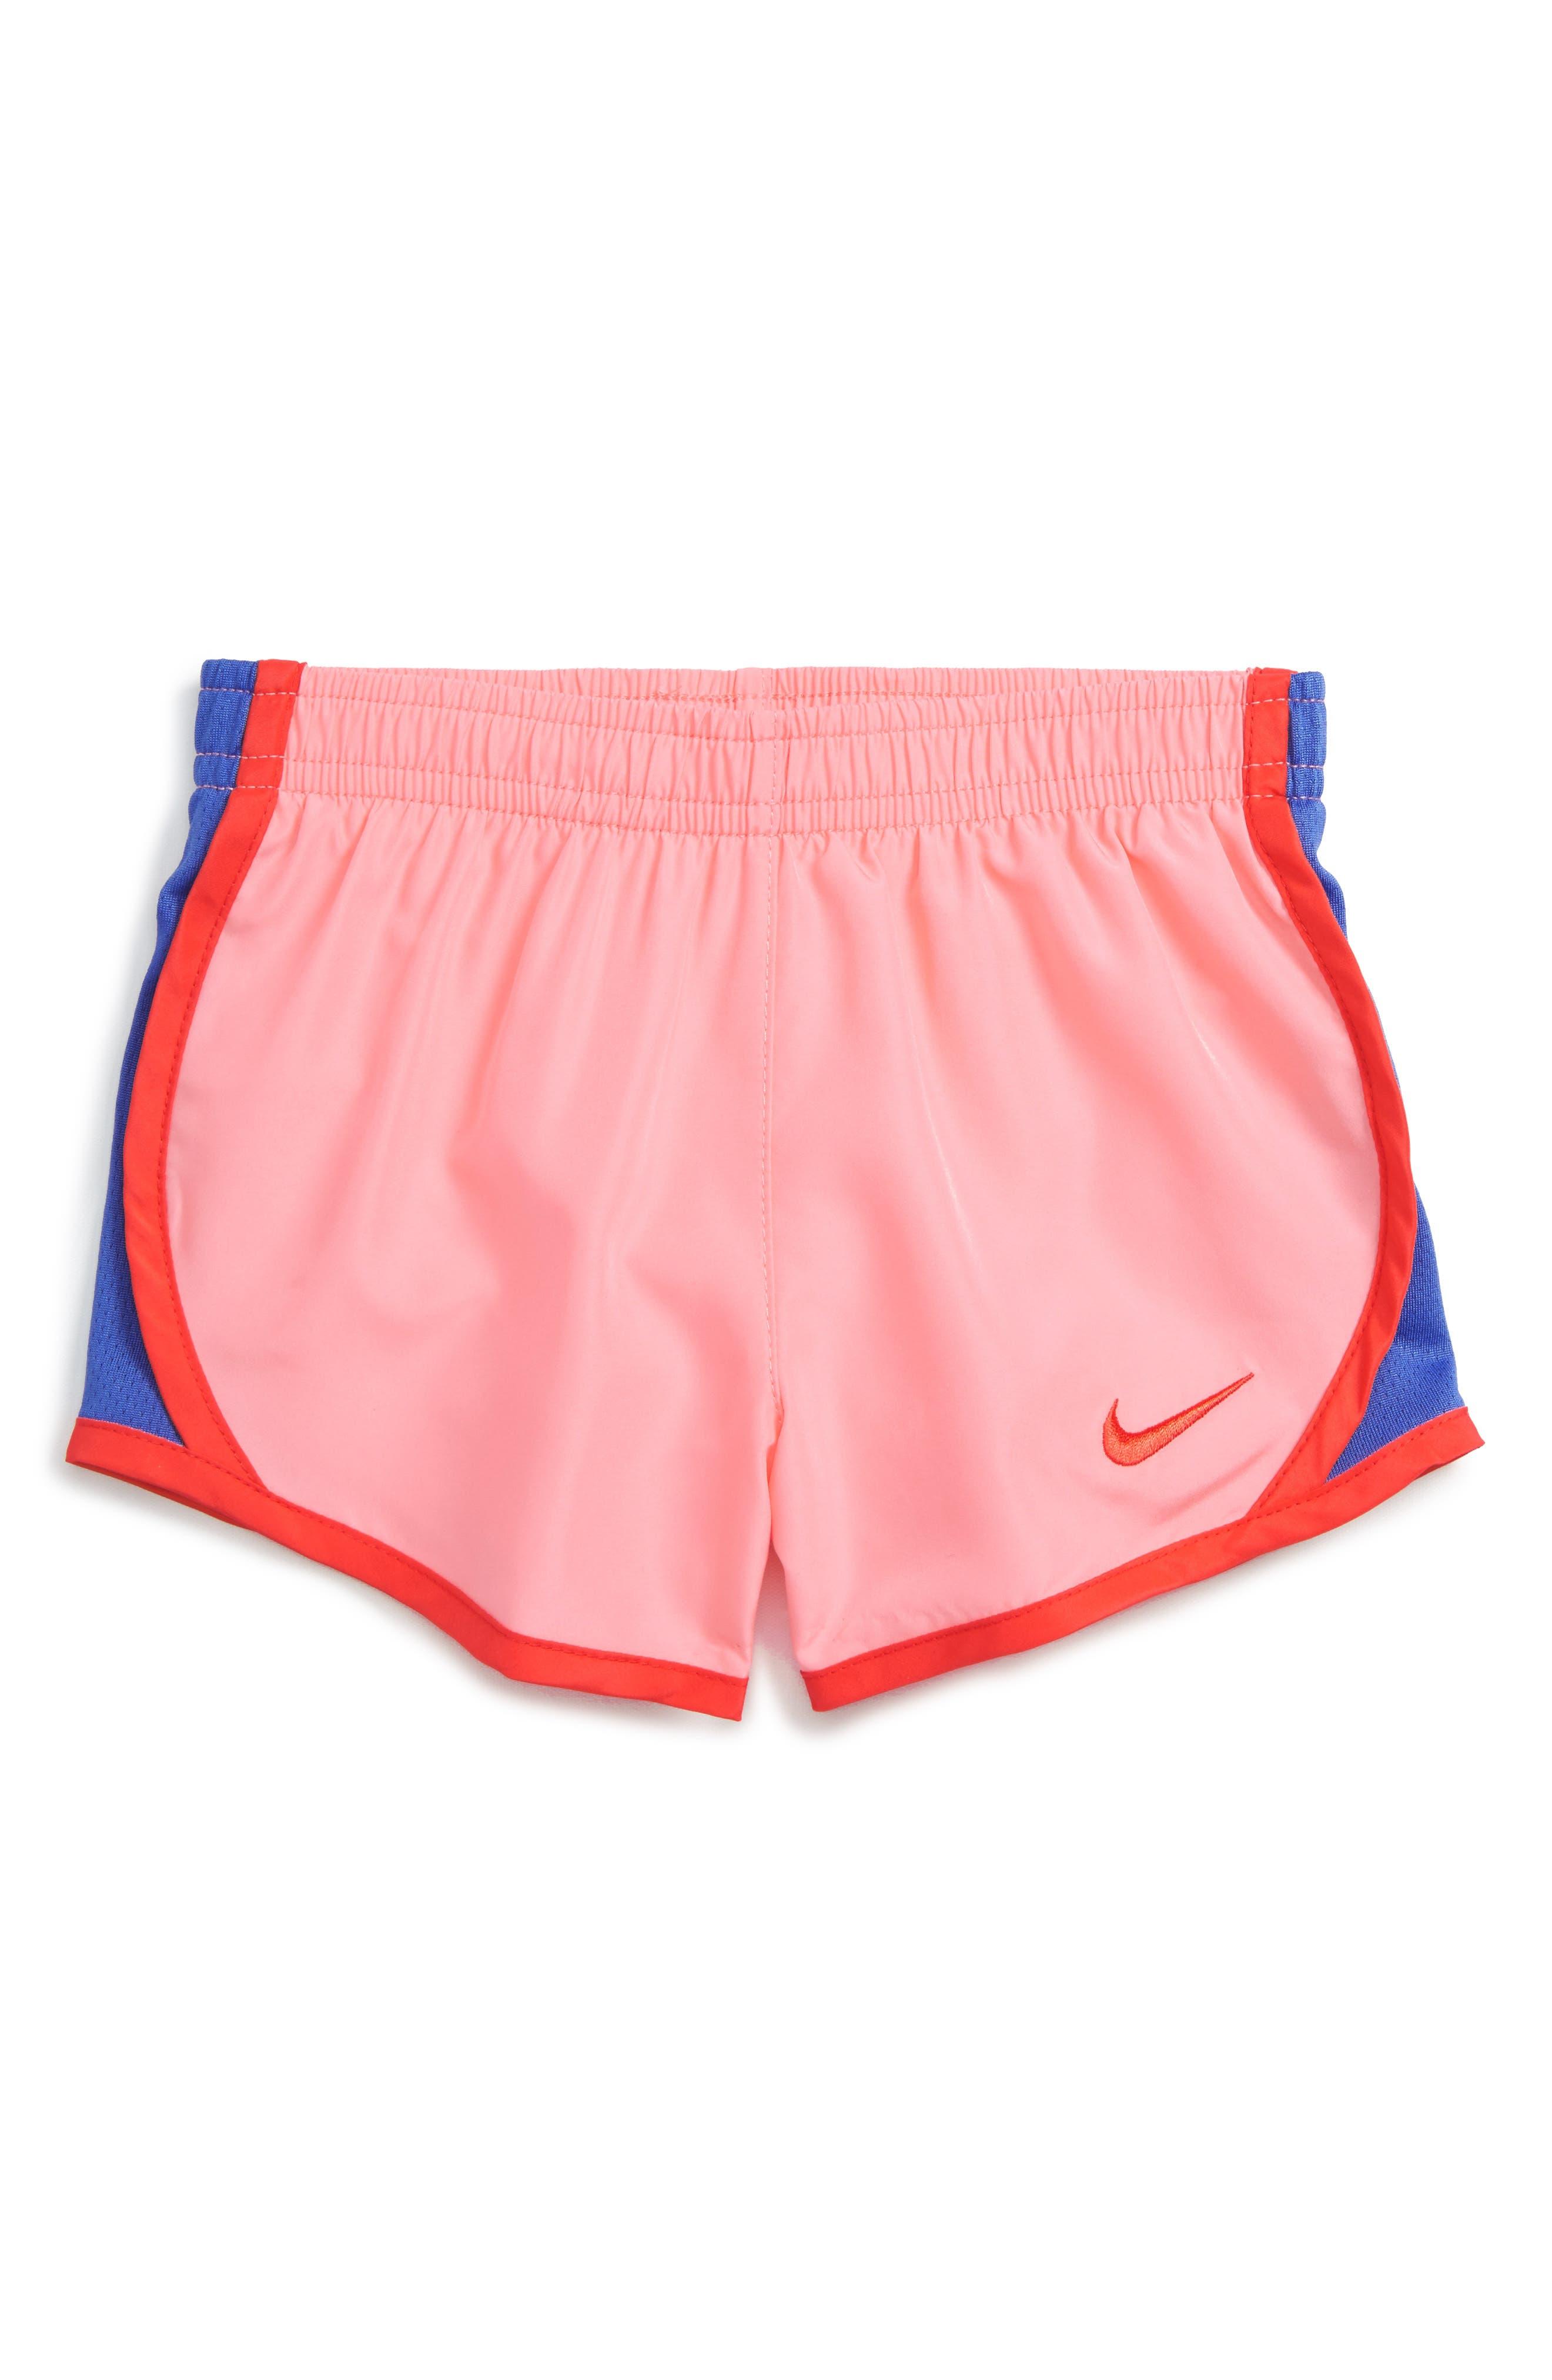 Main Image - Nike Tempo Dri-FIT Shorts (Toddler Girls & Little Girls)